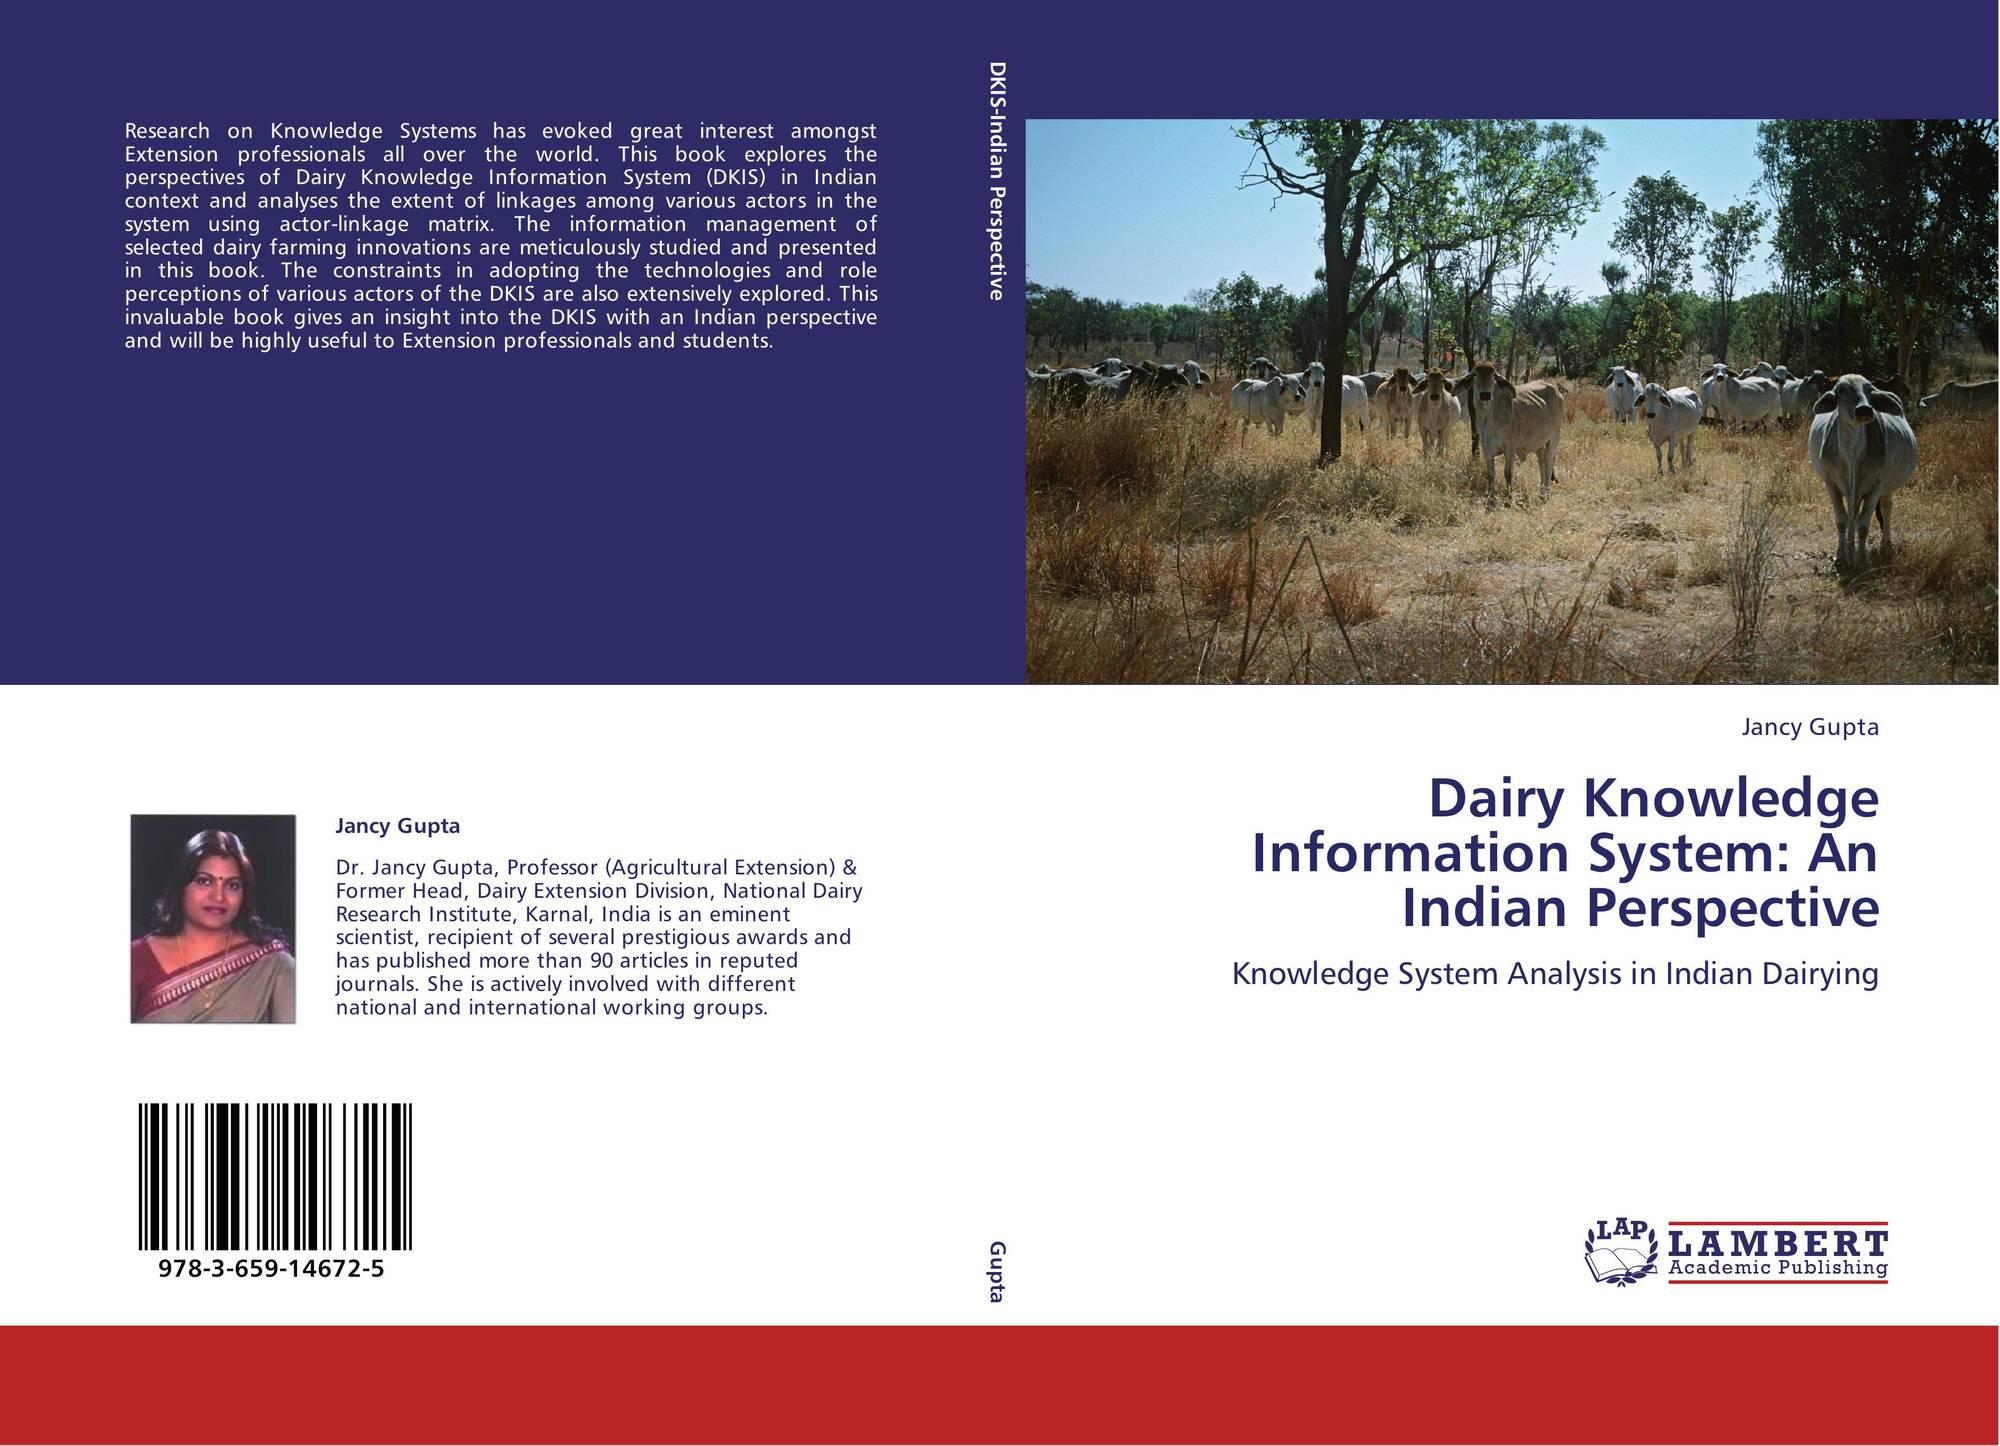 book 11th International